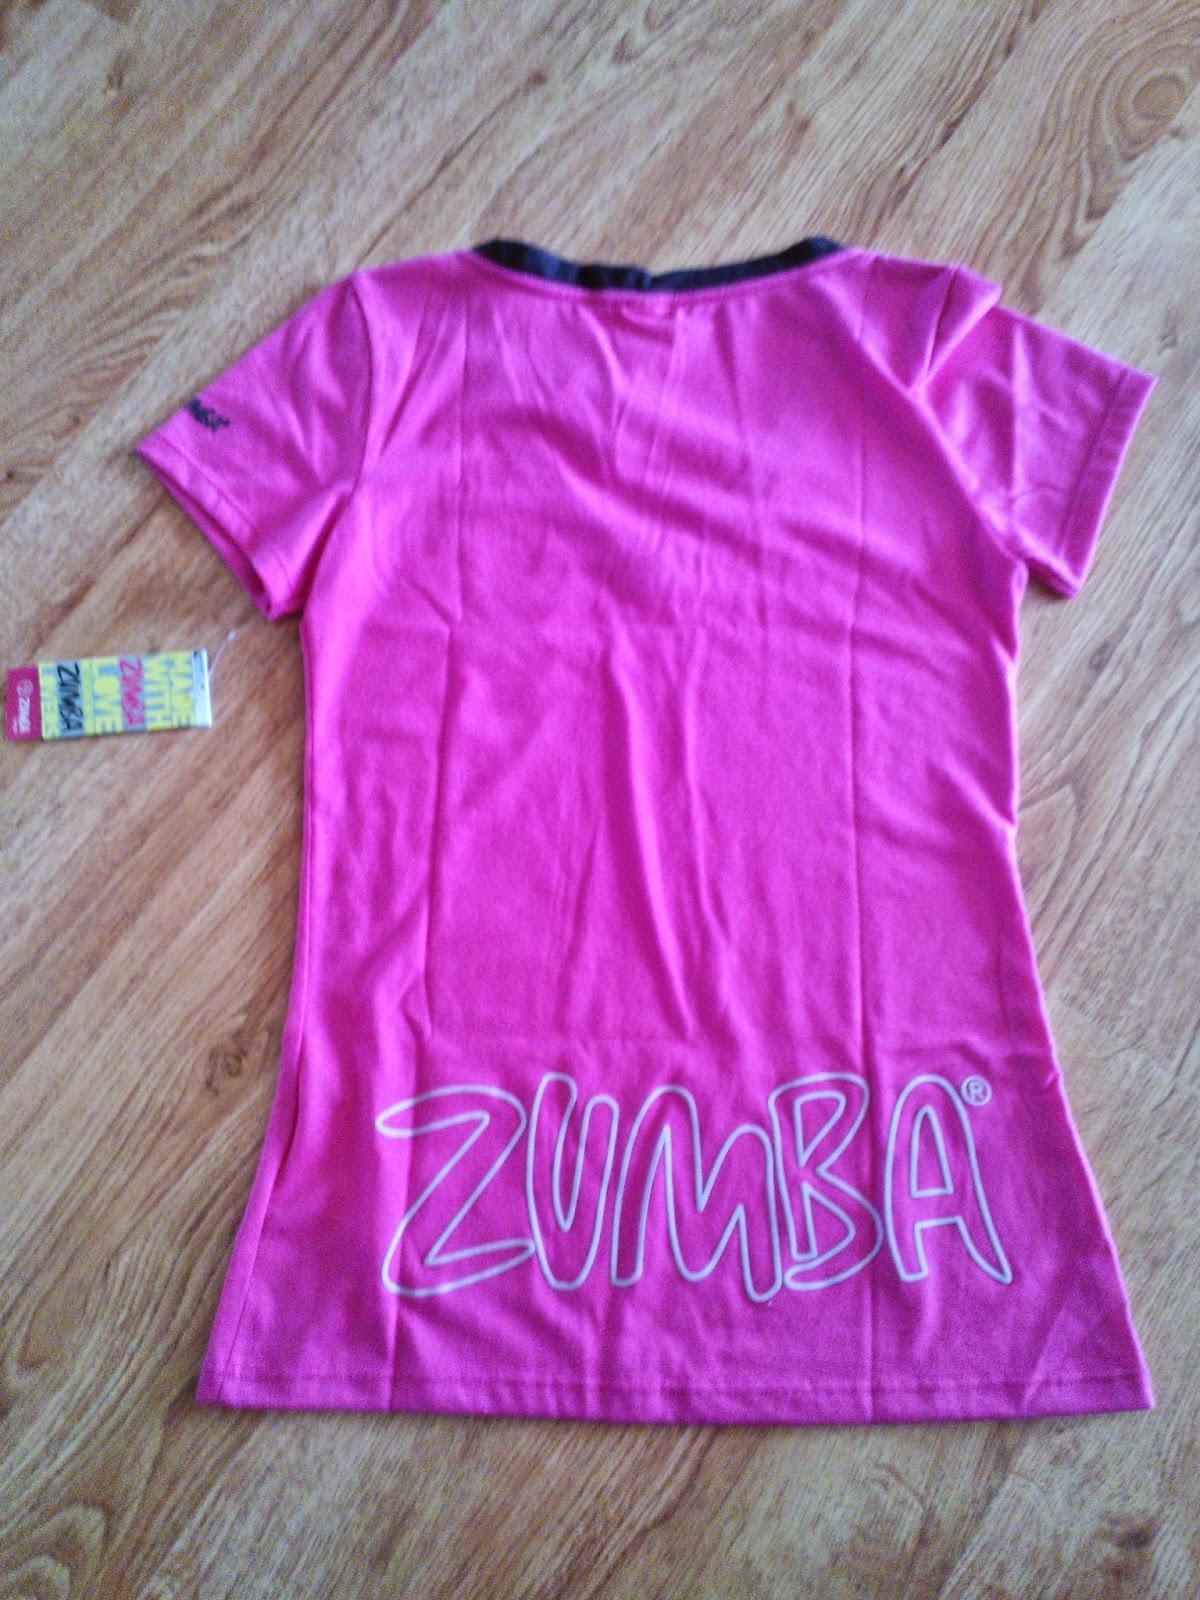 http://www.pinterest.com/mirandadezeeuw/the-zumbawear-closet/